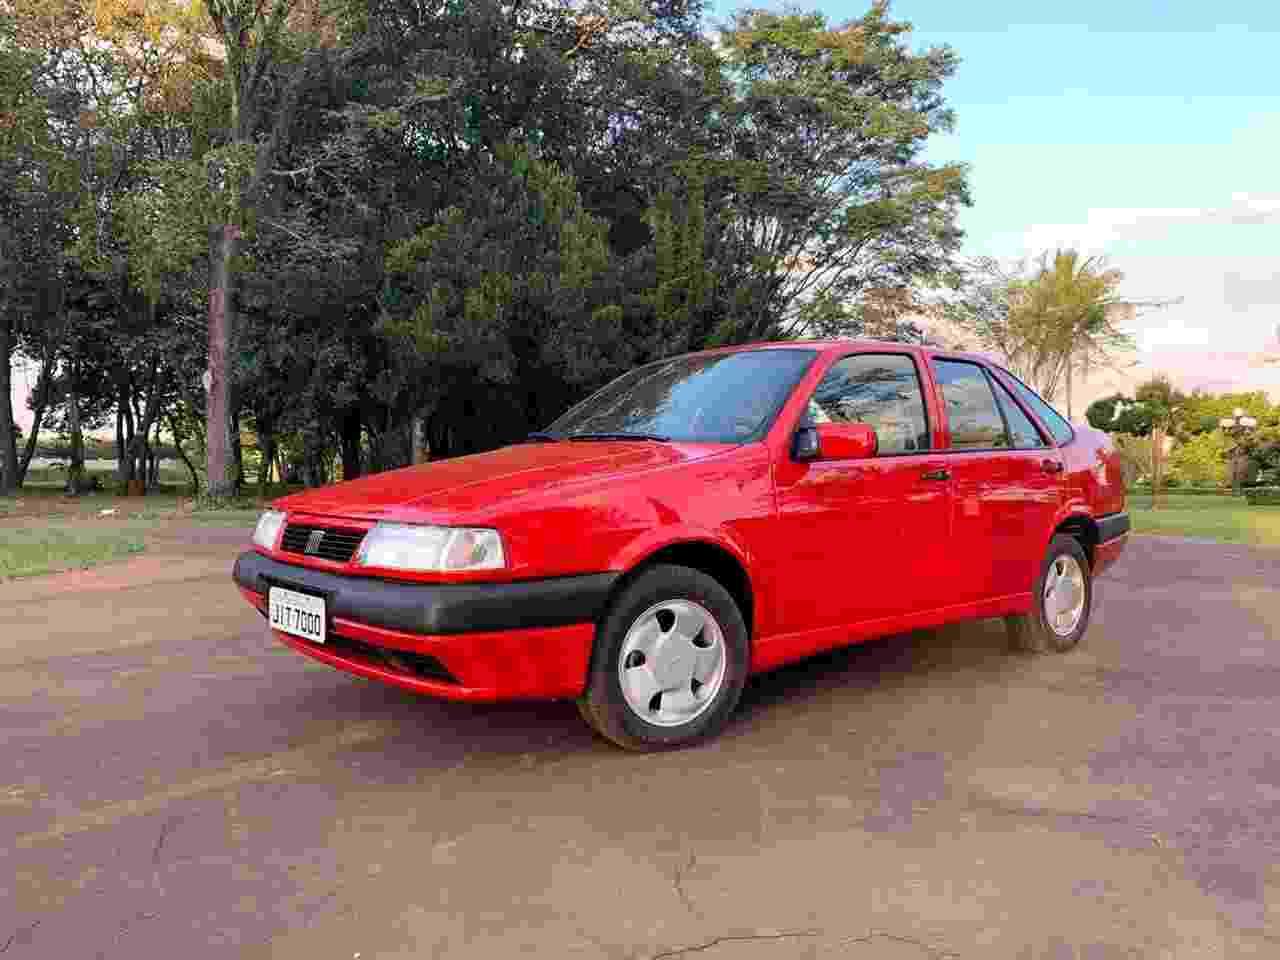 Fiat Tempra Stile turbo 1996 interior bege Alexandre Badolato - Arquivo pessoal